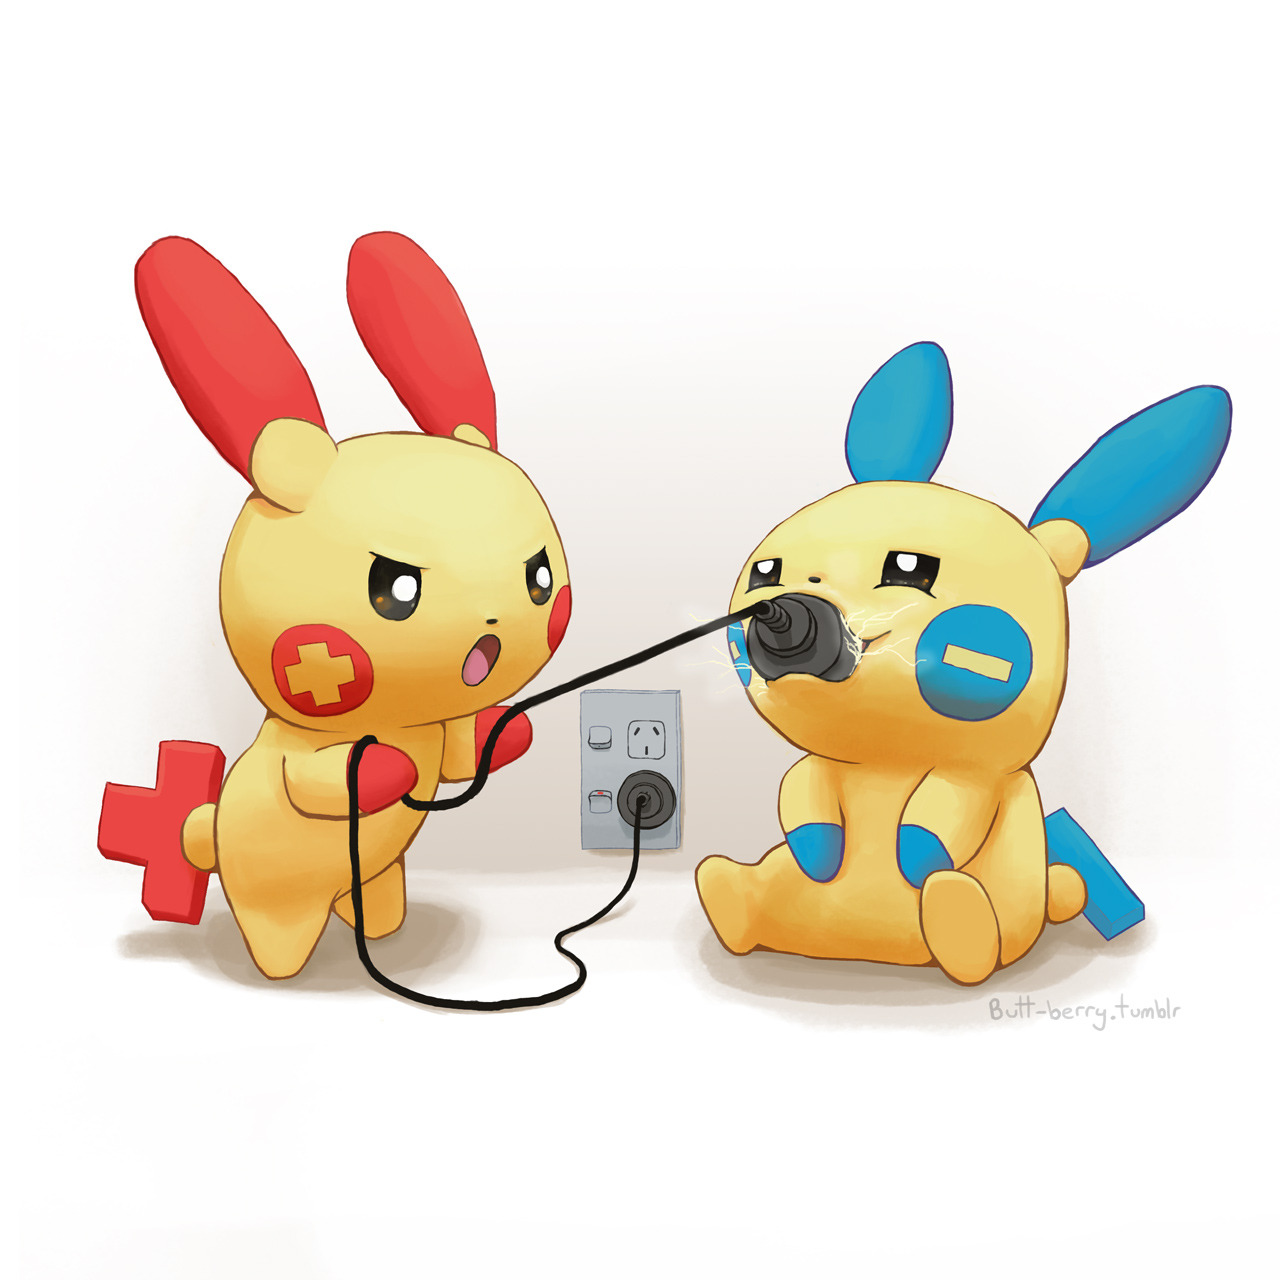 Plusle And Minun Pokemon Drawn By Mcgmark Danbooru